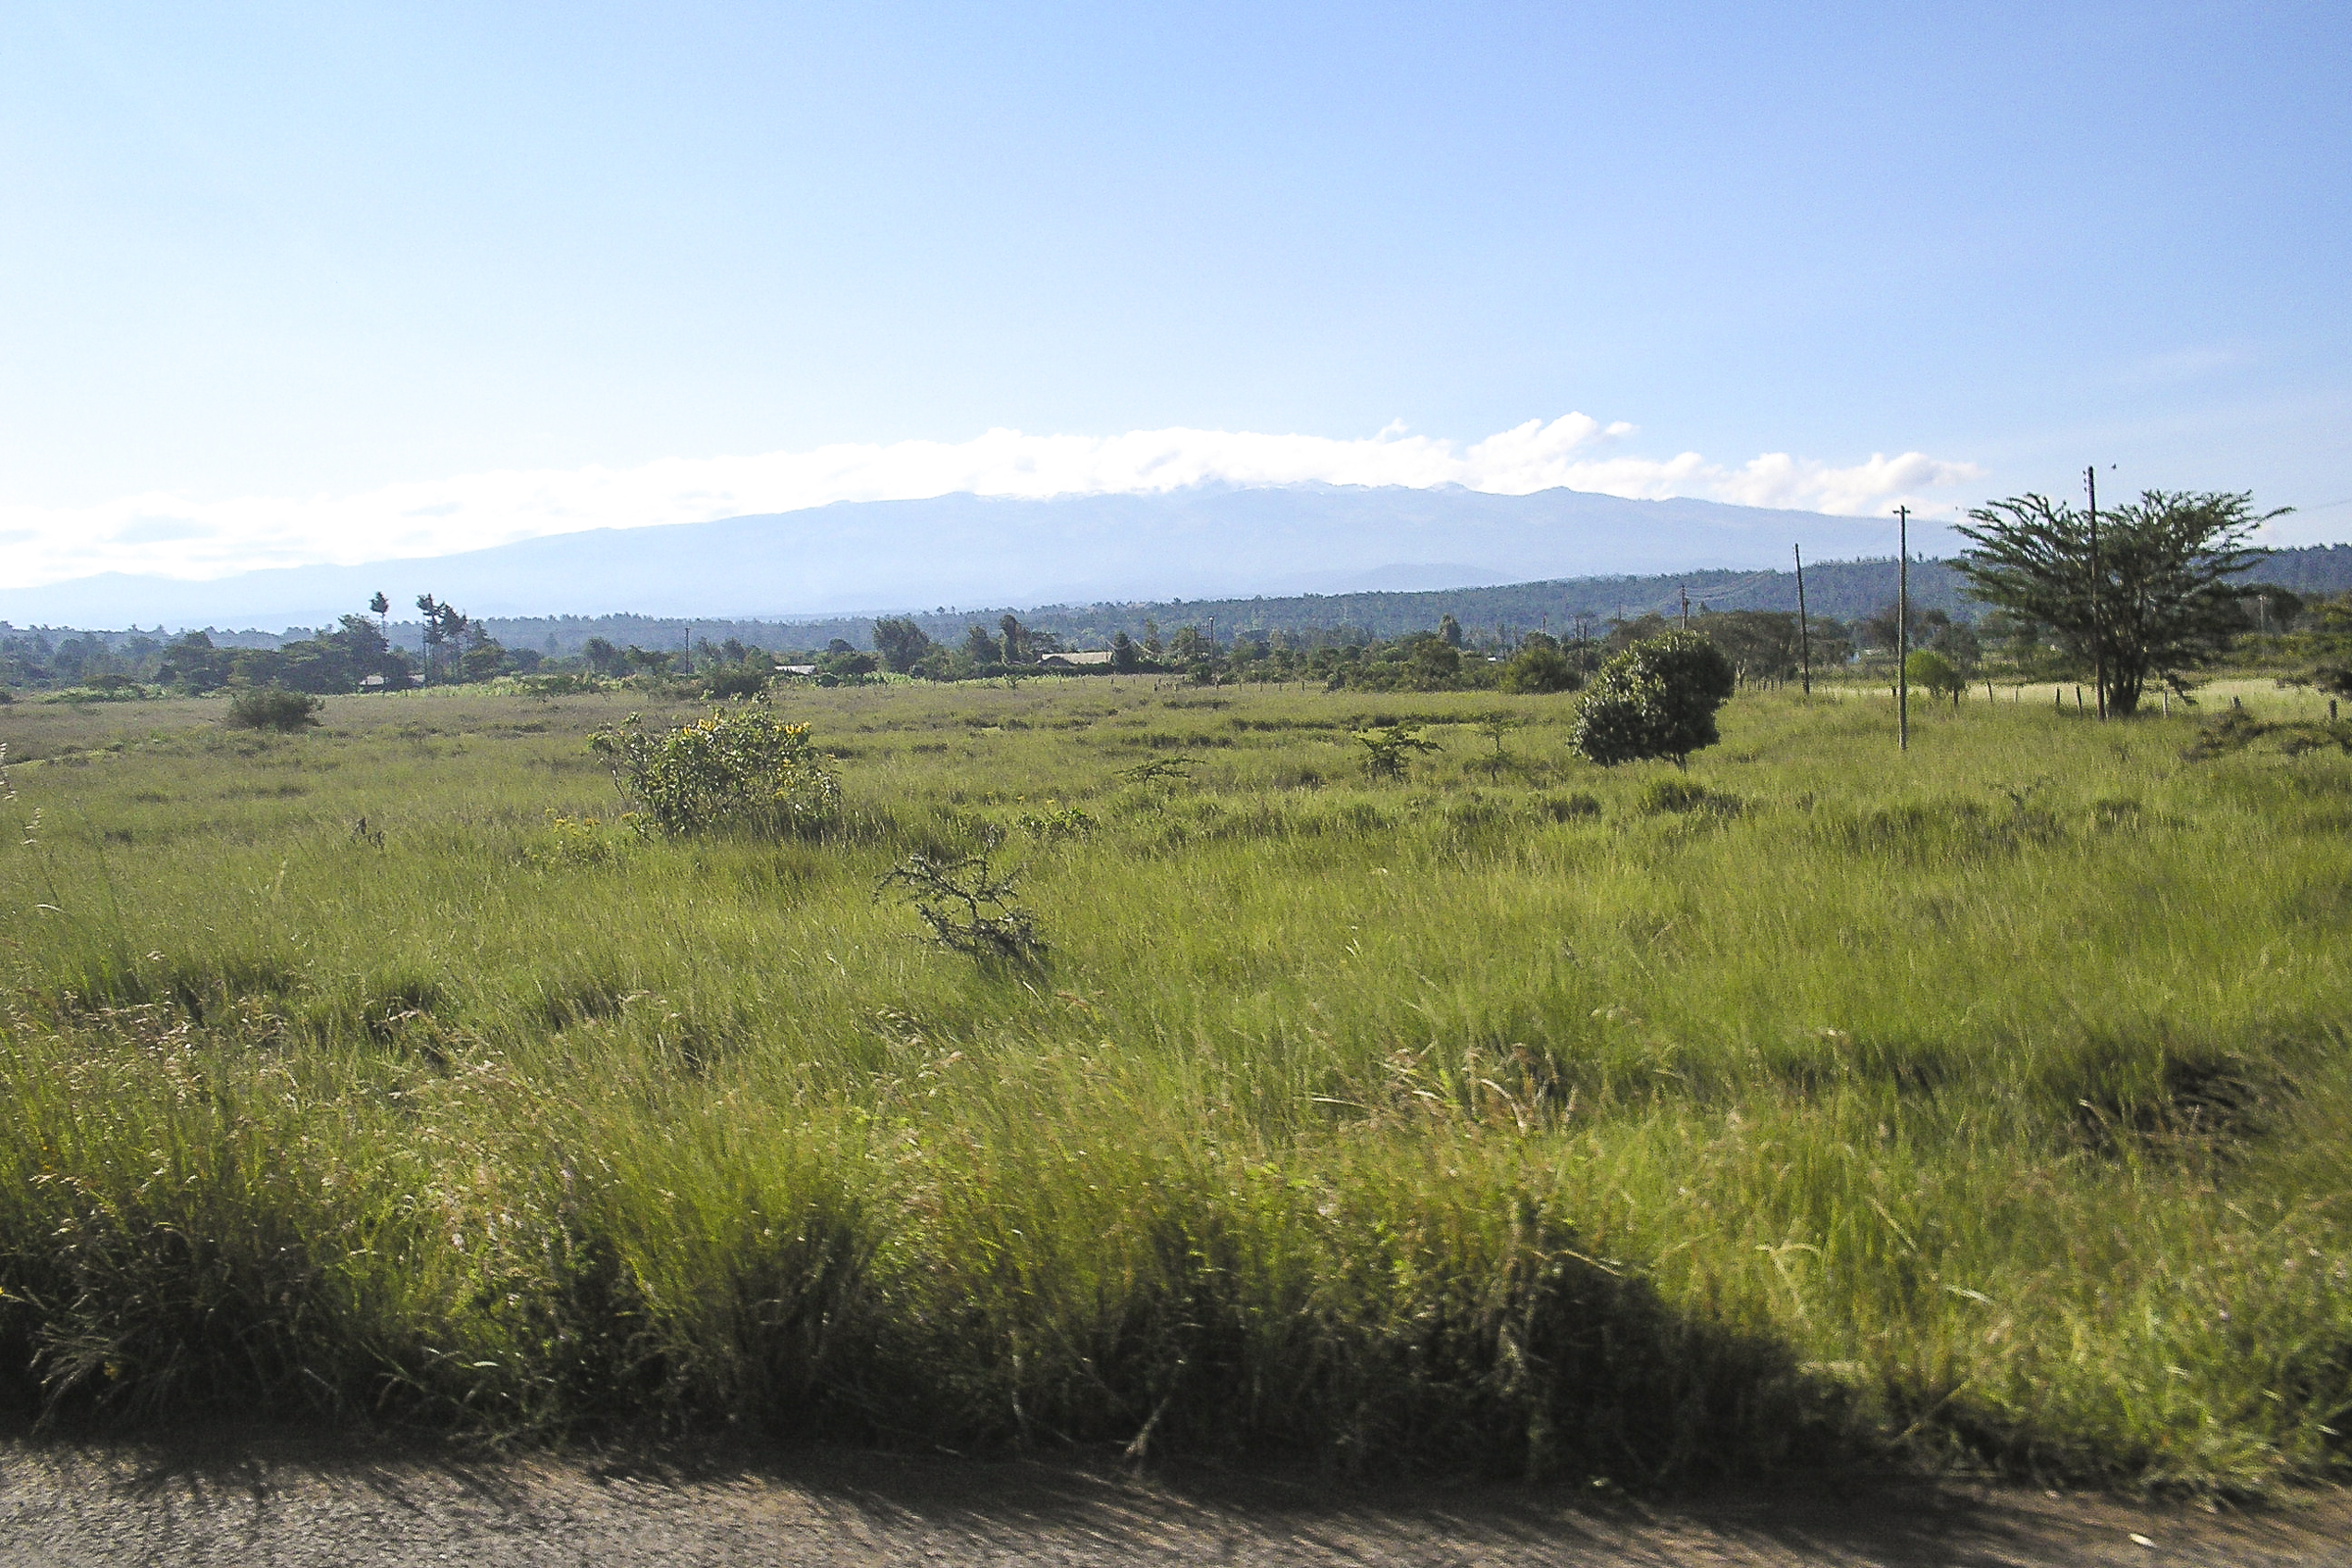 Fahrt Richtung Samburu durch das Rift-Valley